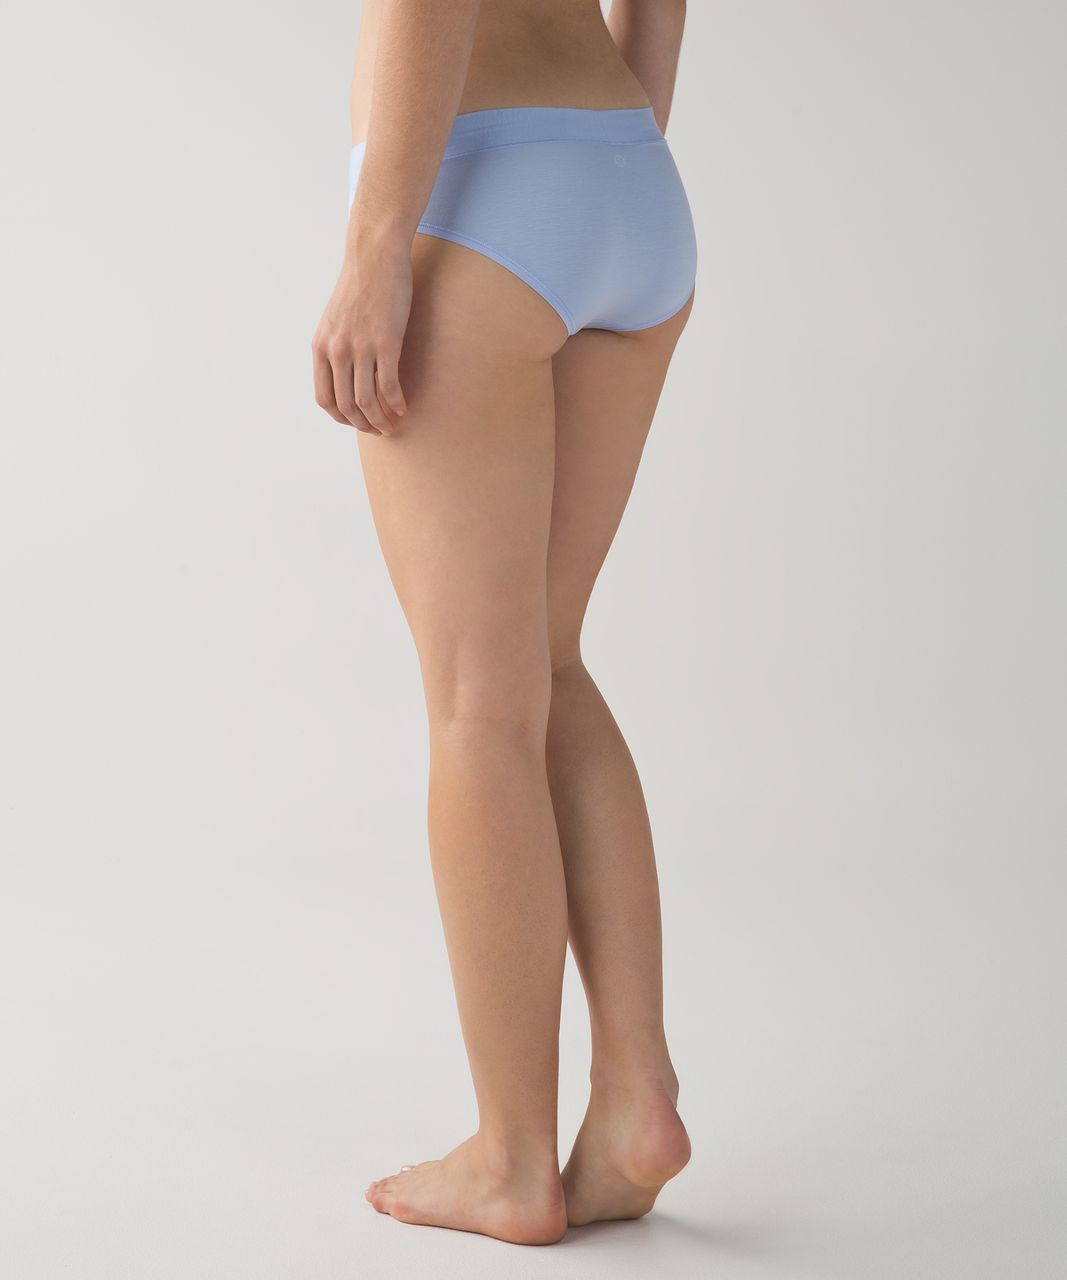 Lululemon Mula Bandhawear Bikini - Lavender Dusk